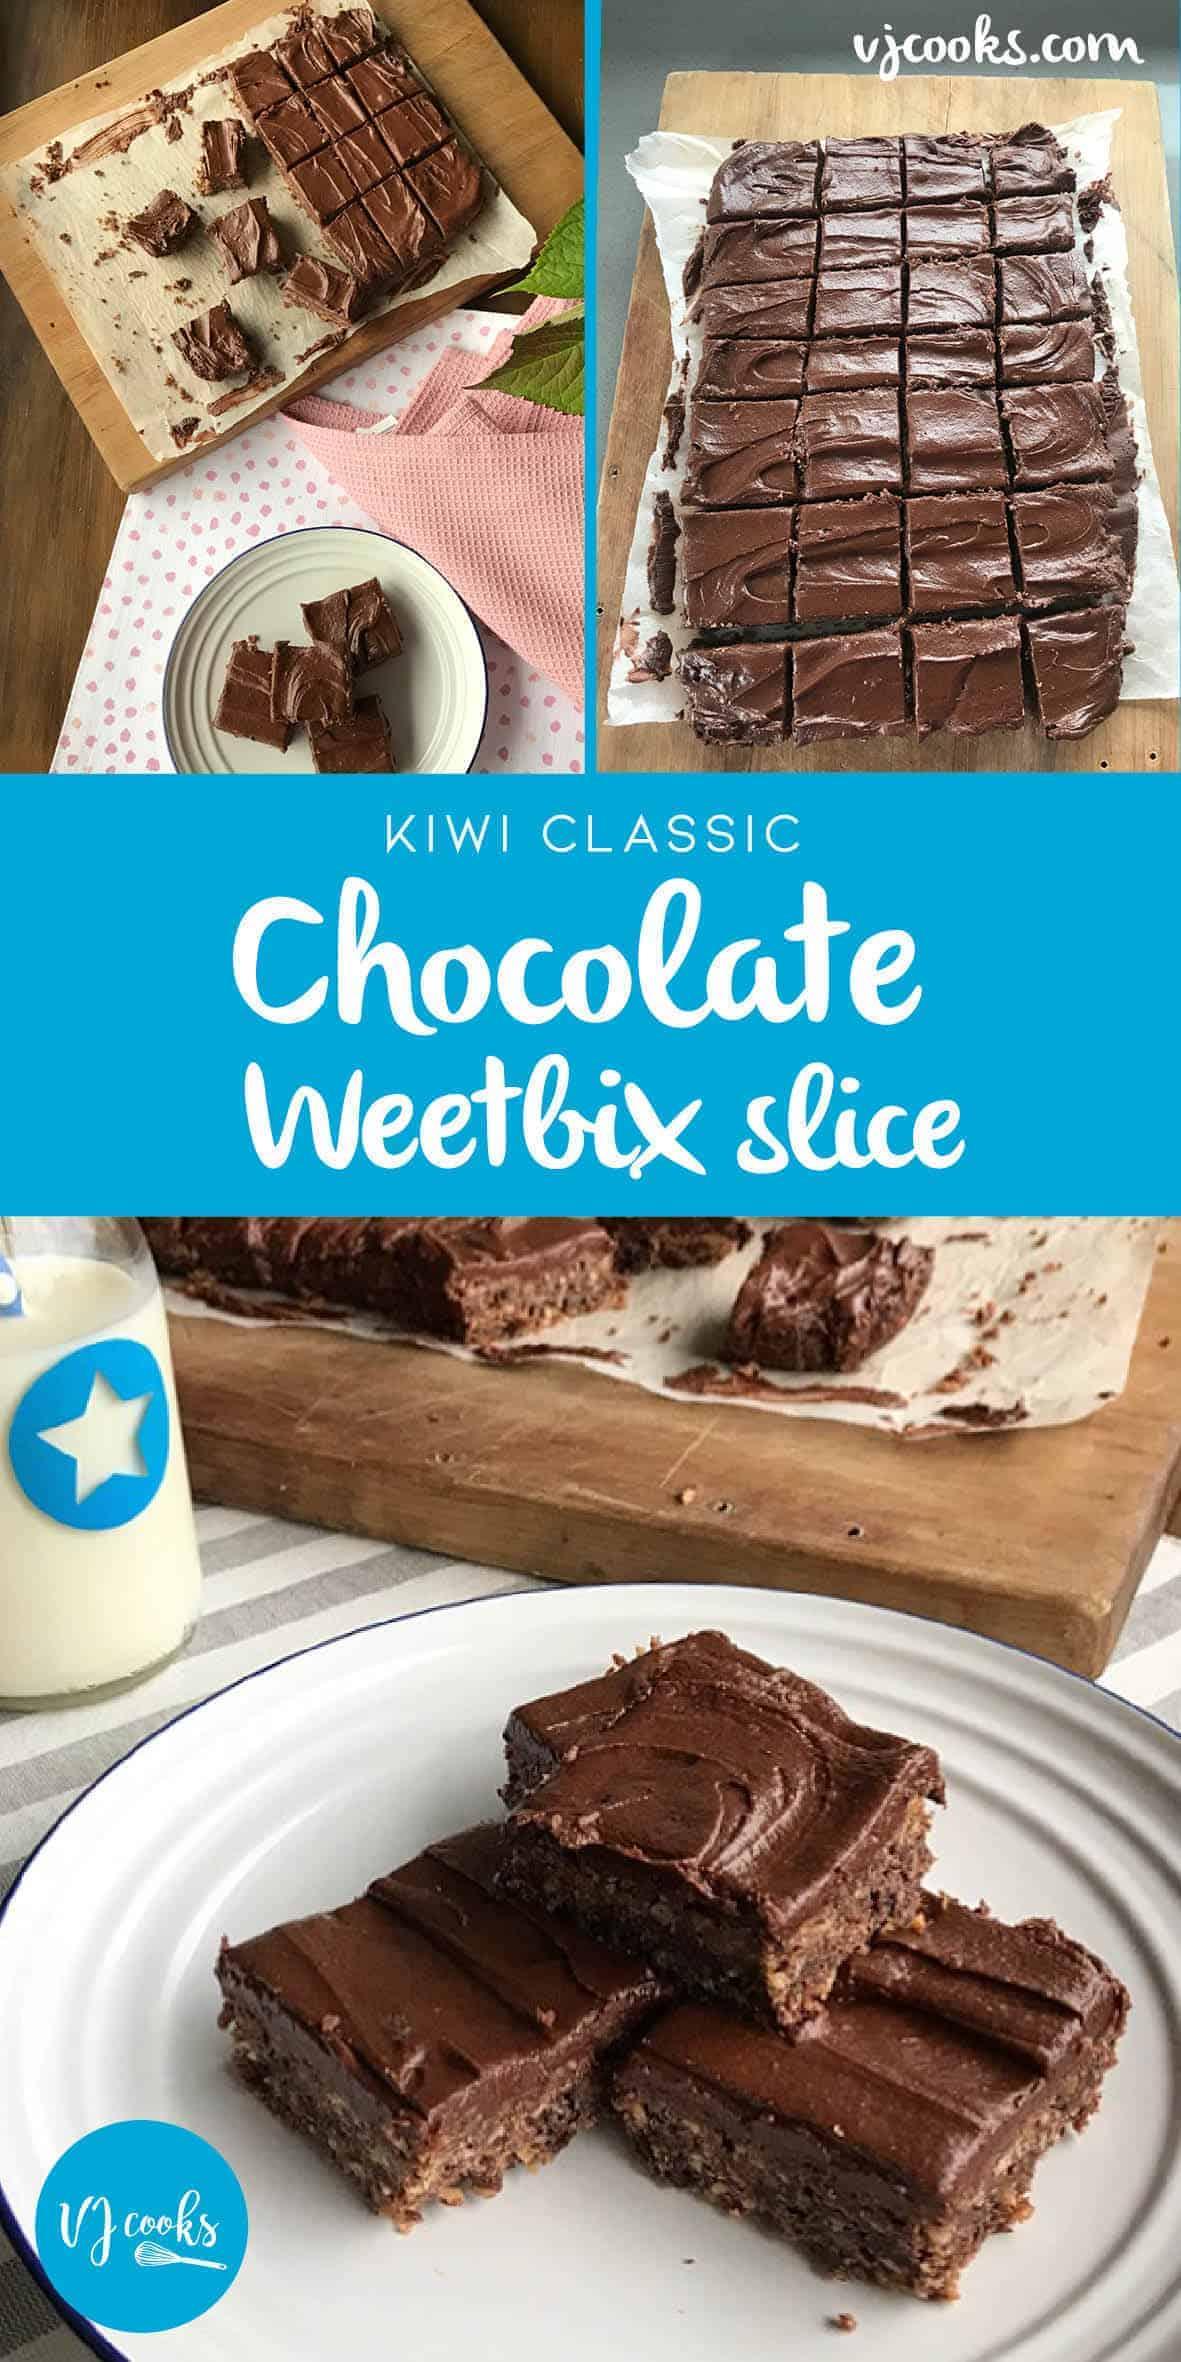 Classic chocolate Weetbix slice a kiwi classic from VJ Cooks.